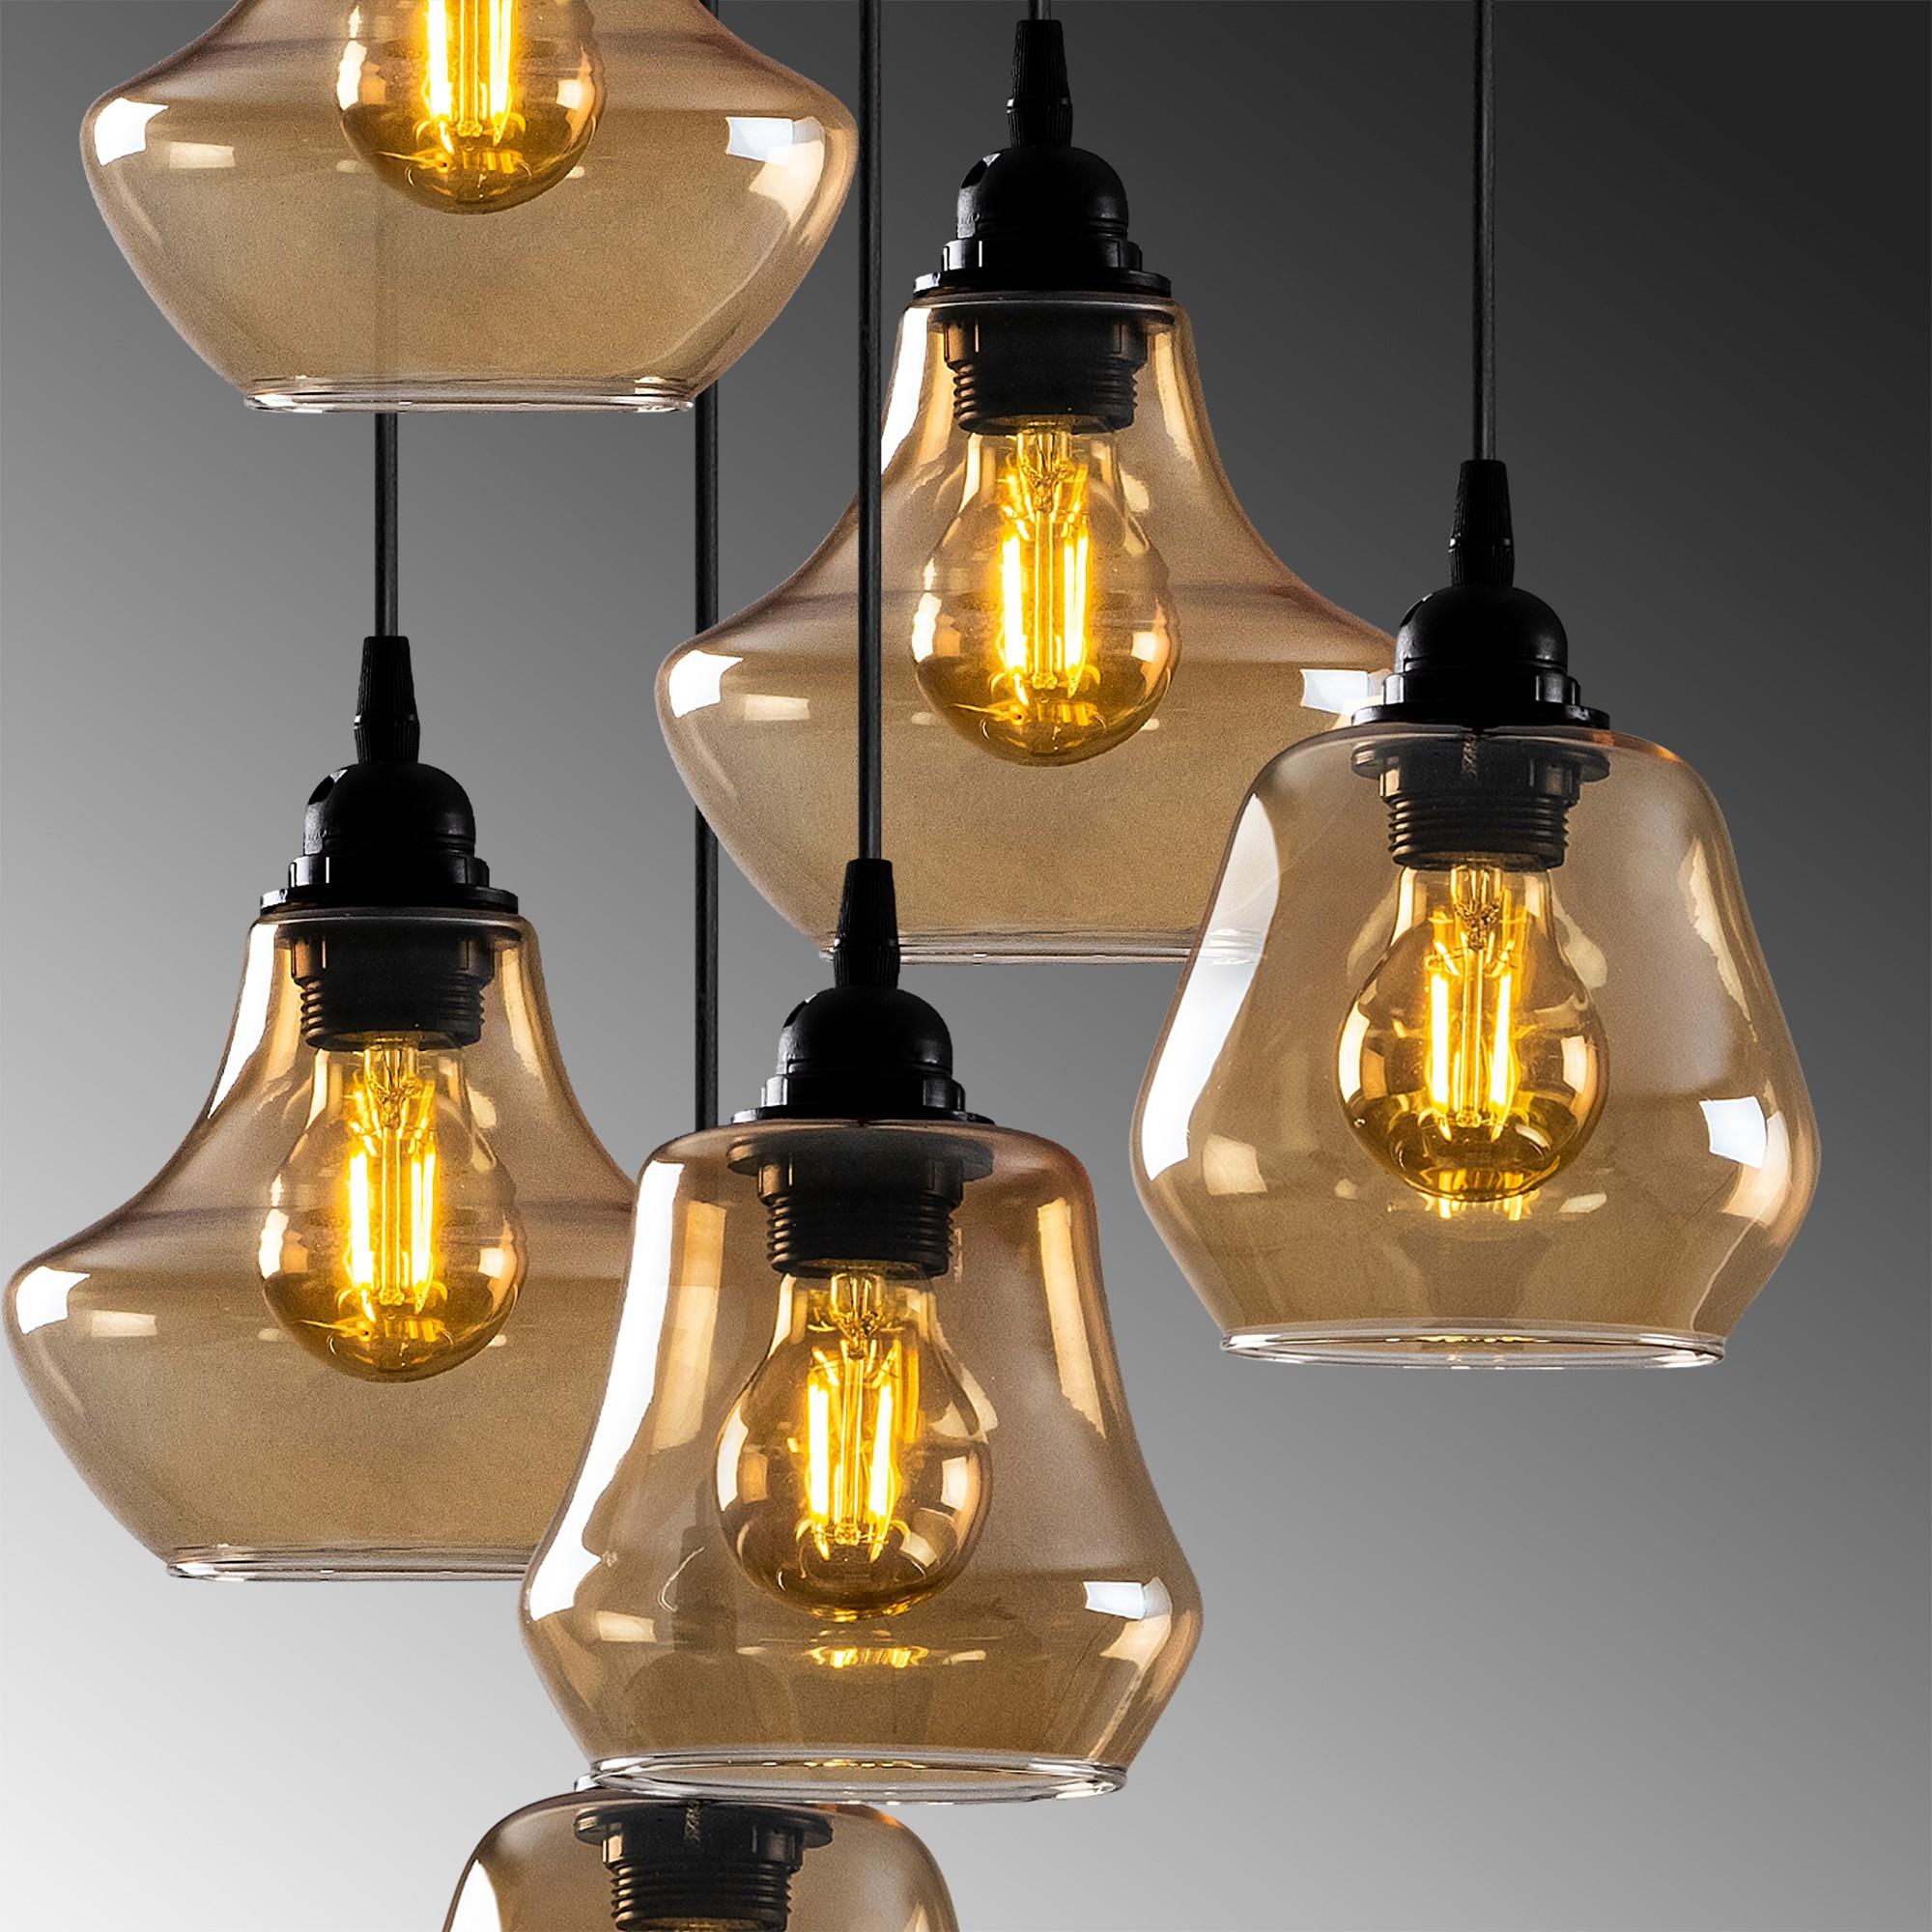 Hanglamp golden glass - goud glas 7 x E27 fitting - closeup